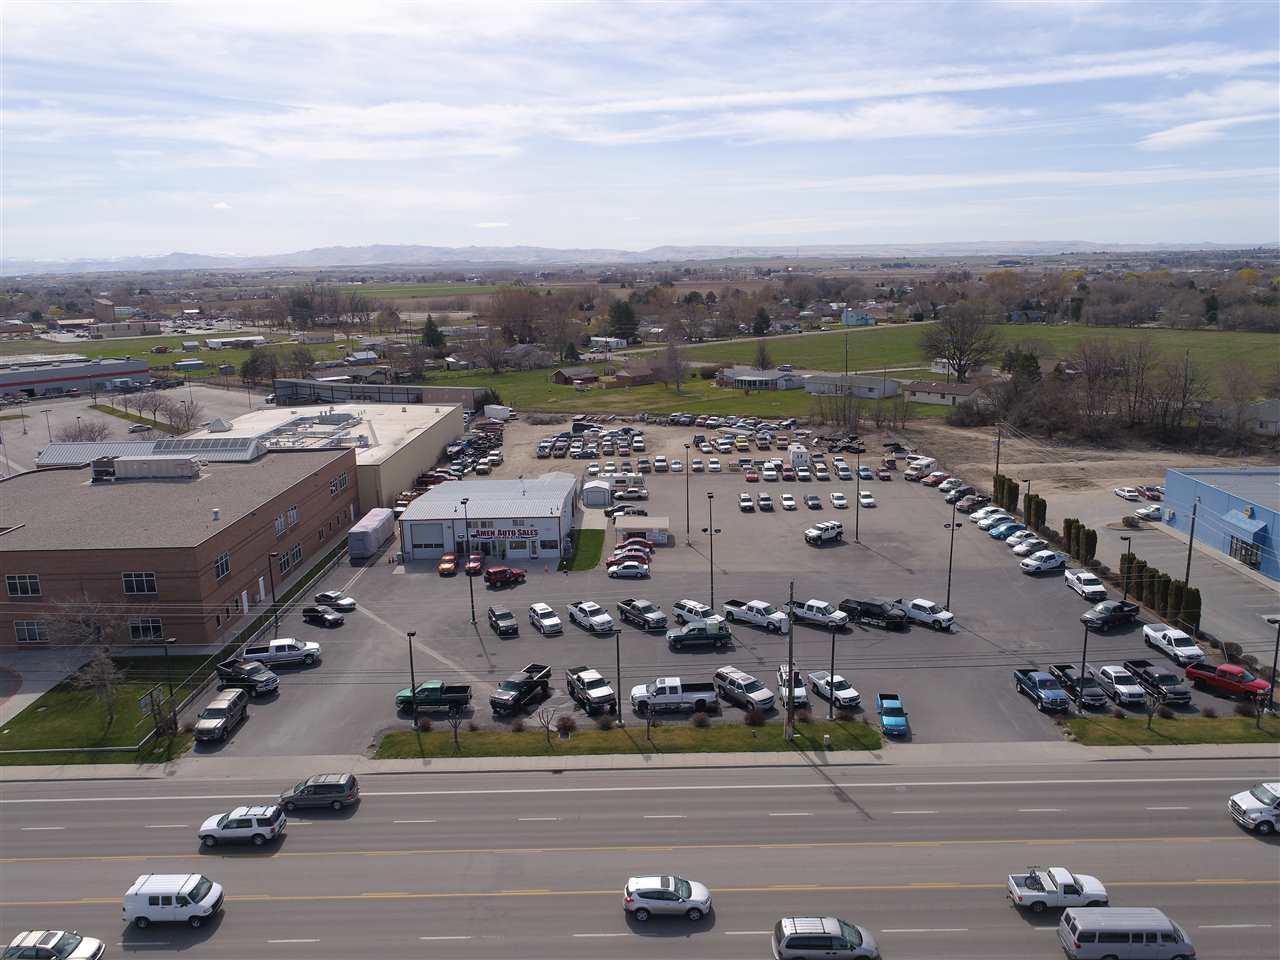 2417 Caldwell Blvd,Nampa,Idaho 83651,Business/Commercial,2417 Caldwell Blvd,98688150